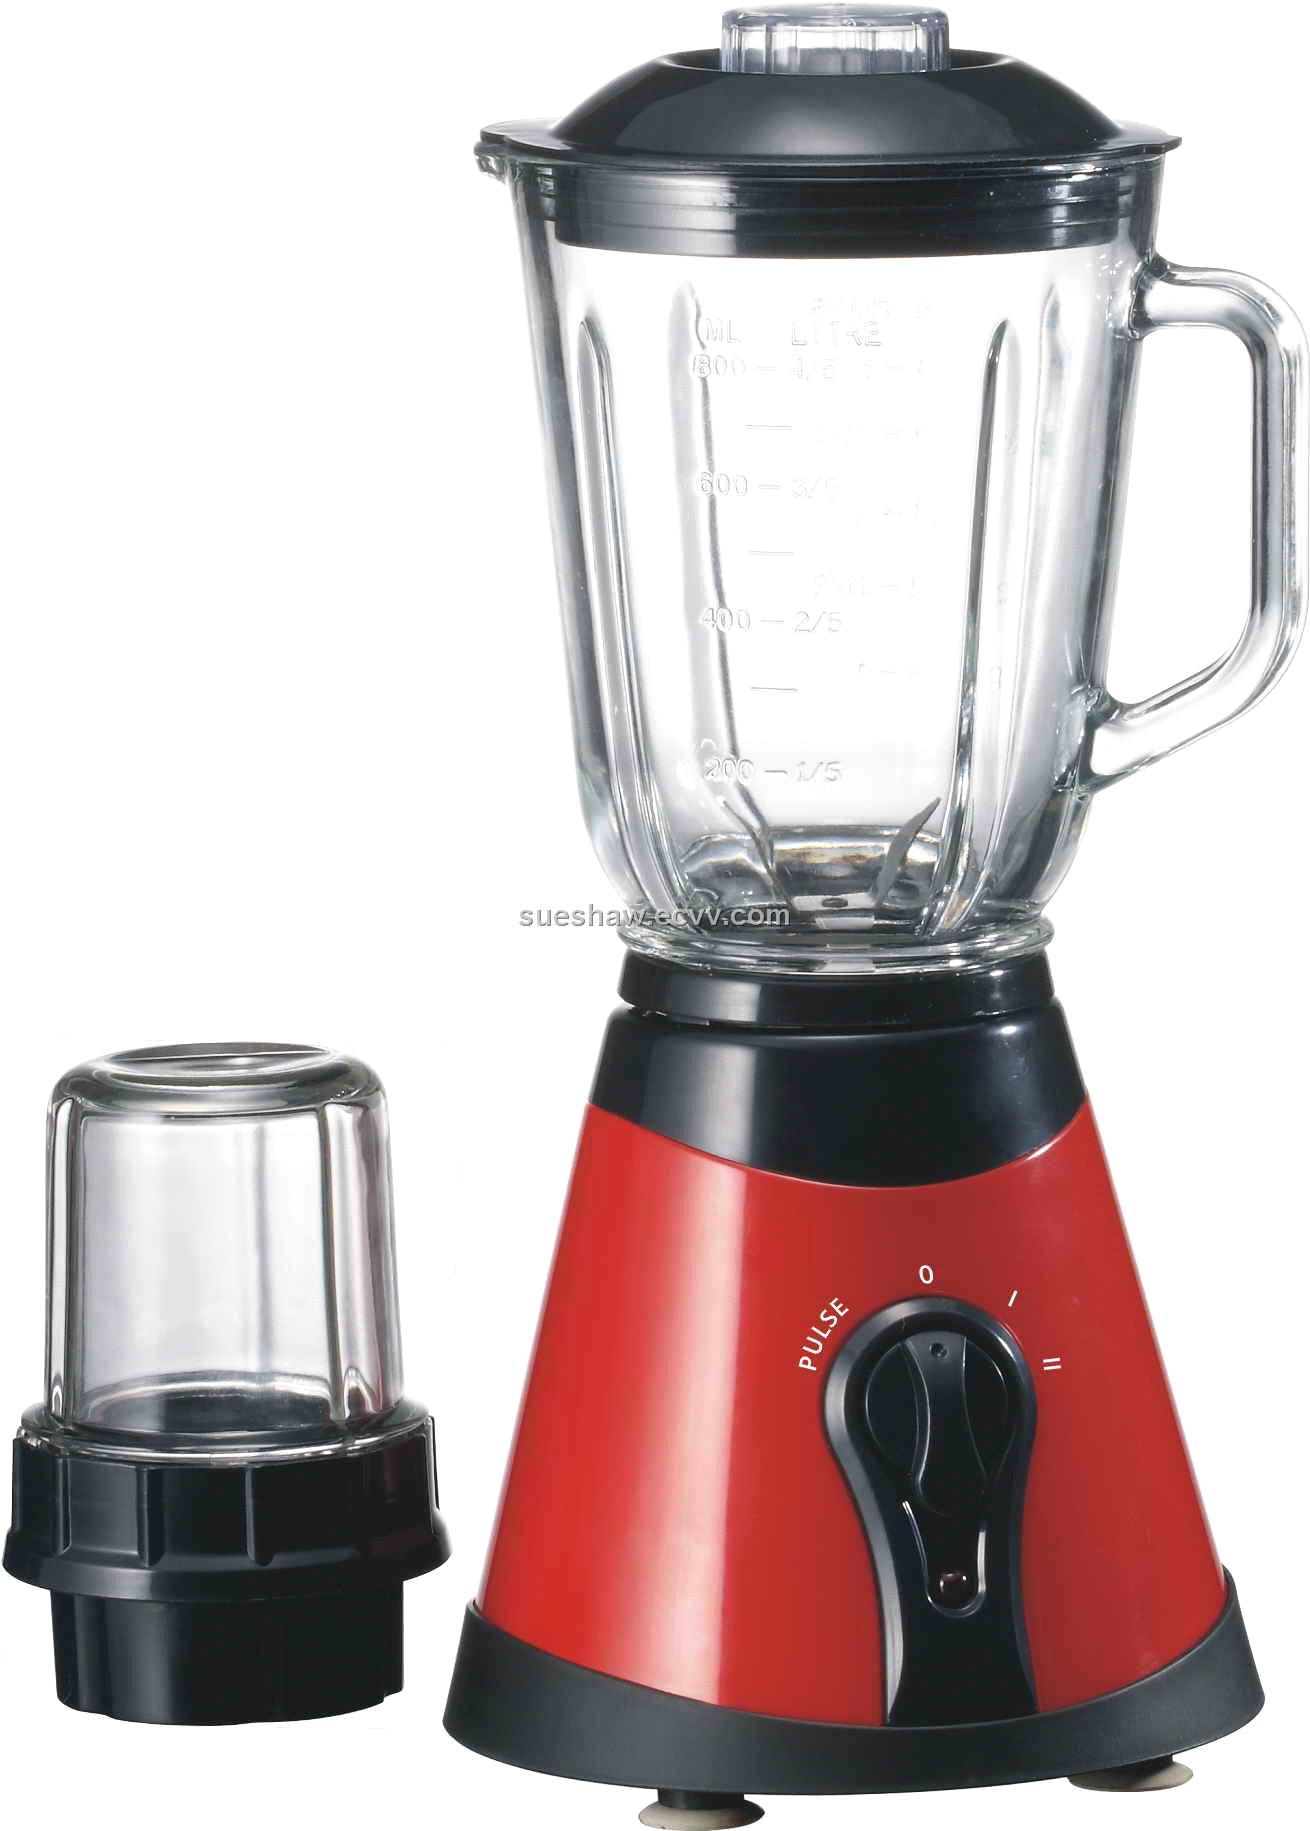 Ninja food processor replacement lid free great affordable blenders 1753 mixer food processor - Flamingo pink kitchenaid mixer ...